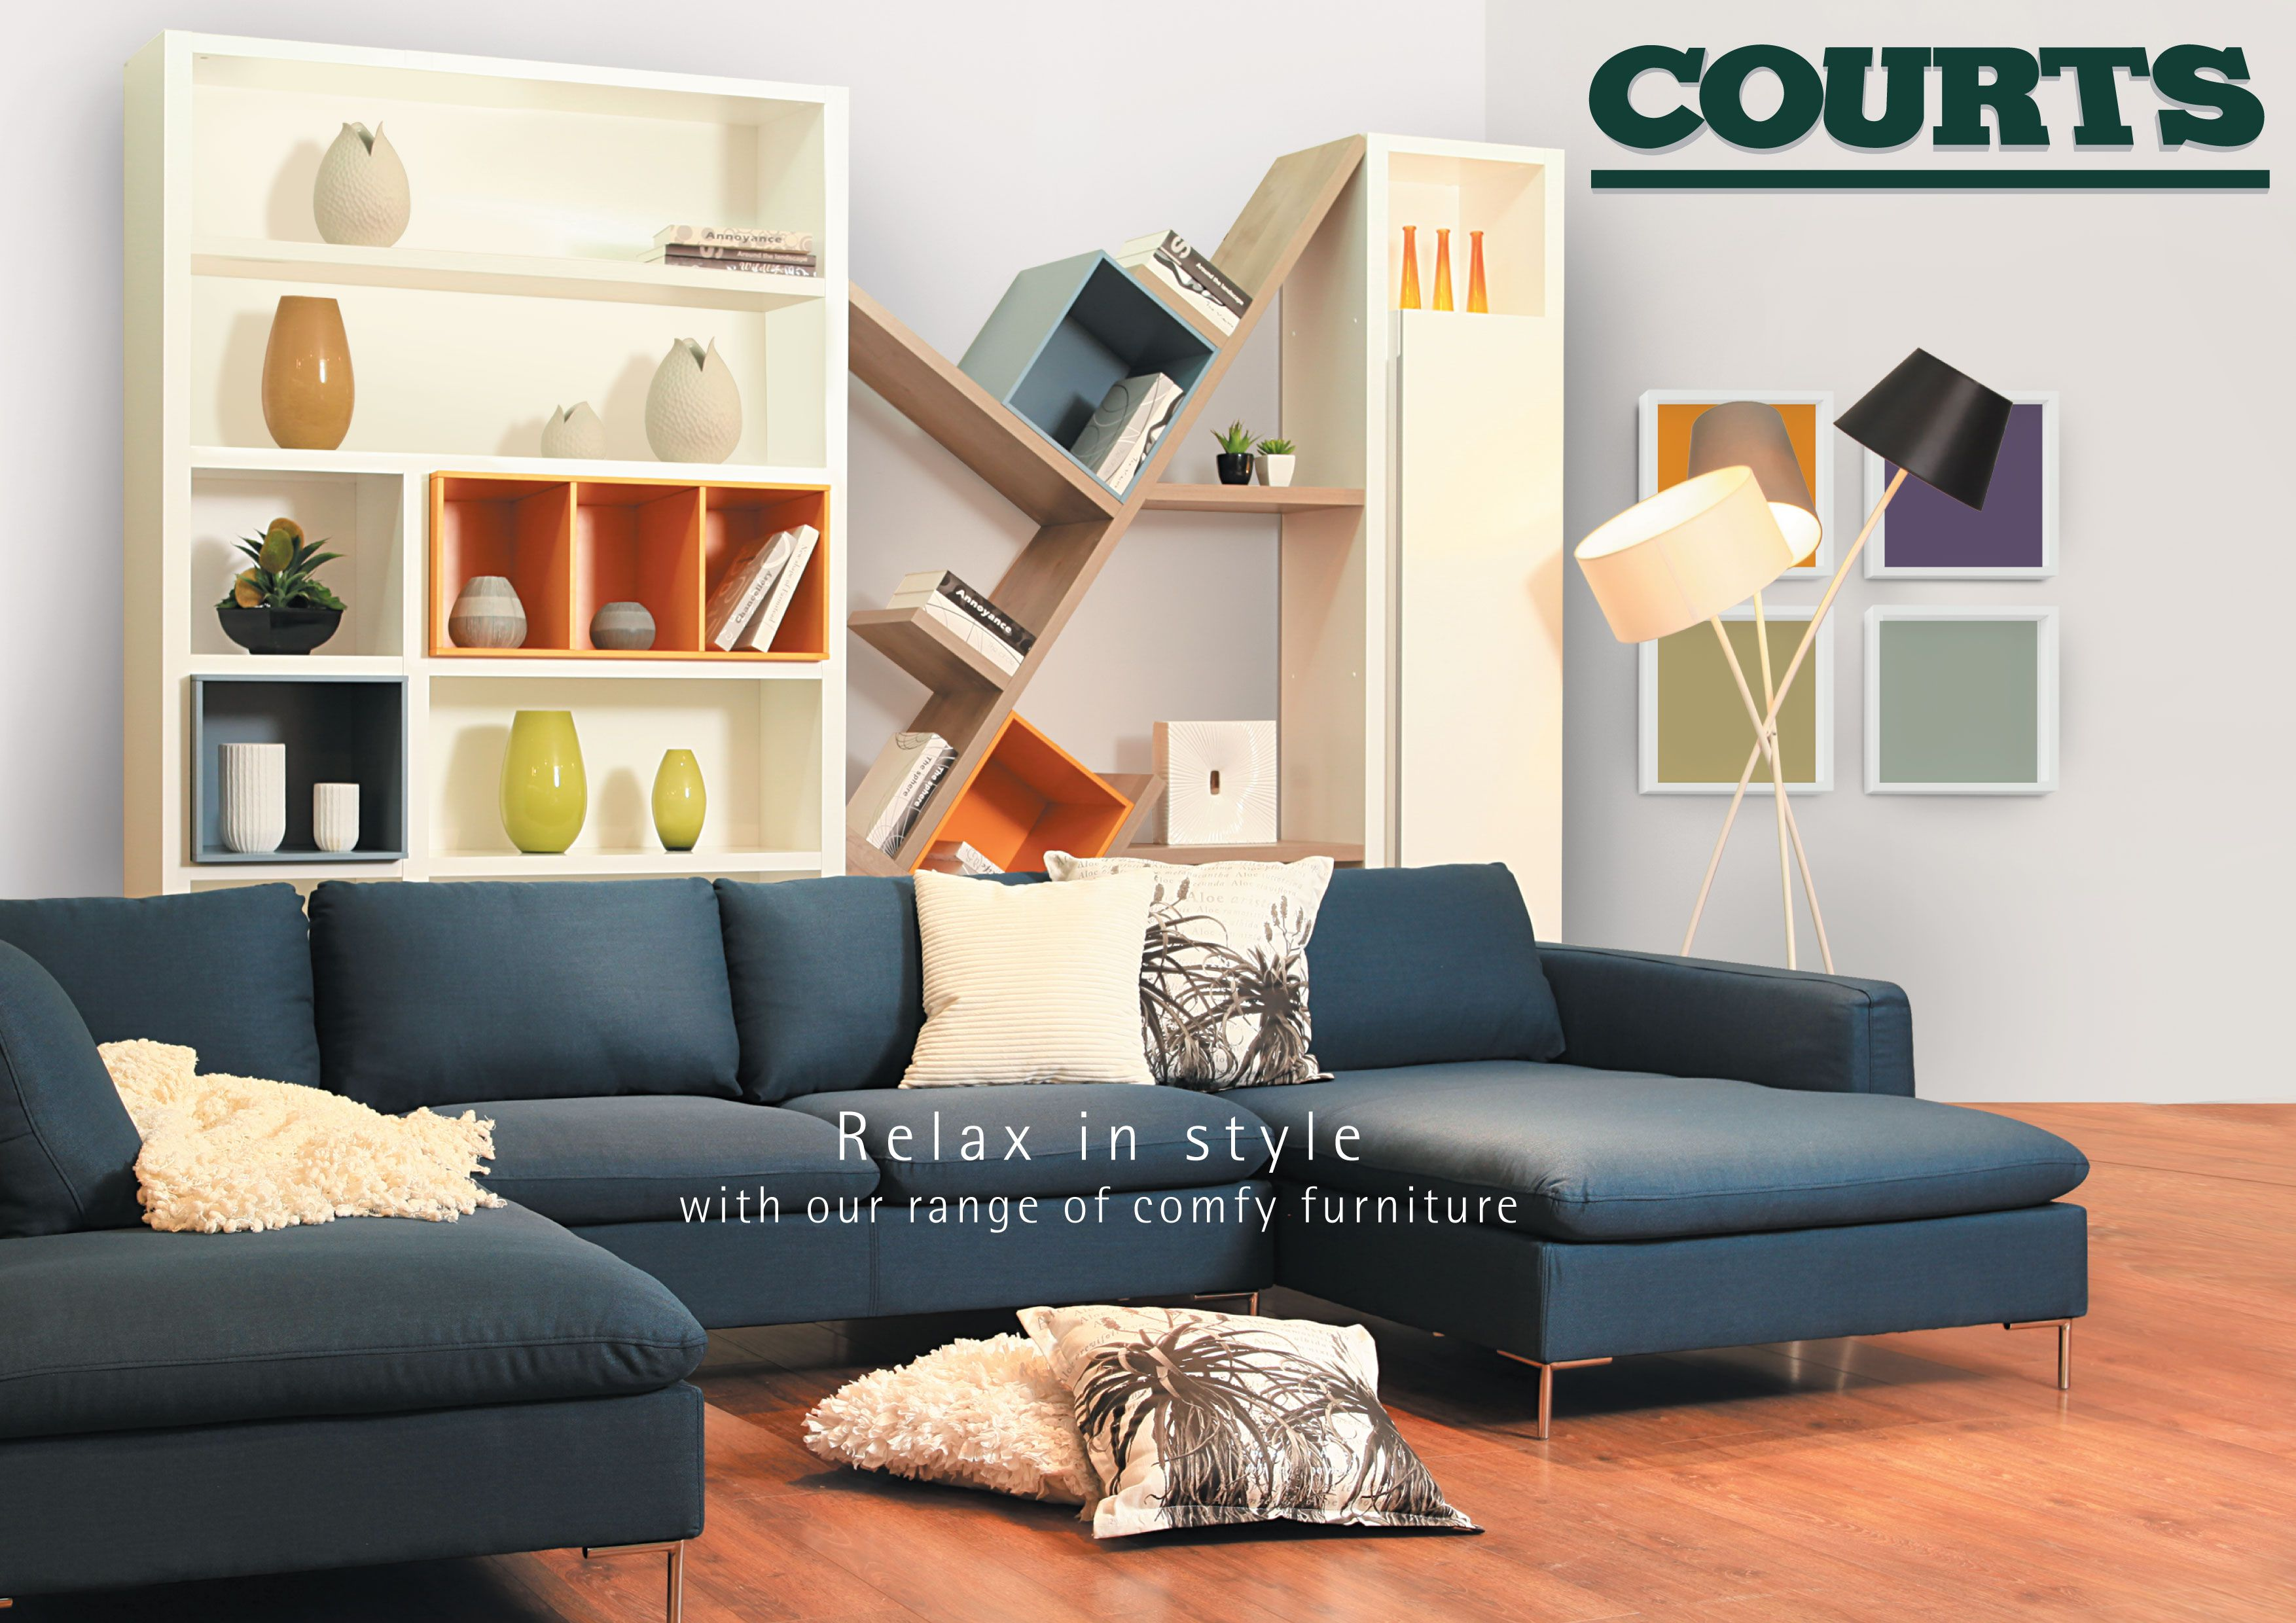 Courts Mauritius Furniture Catalogue 8  Furniture catalog